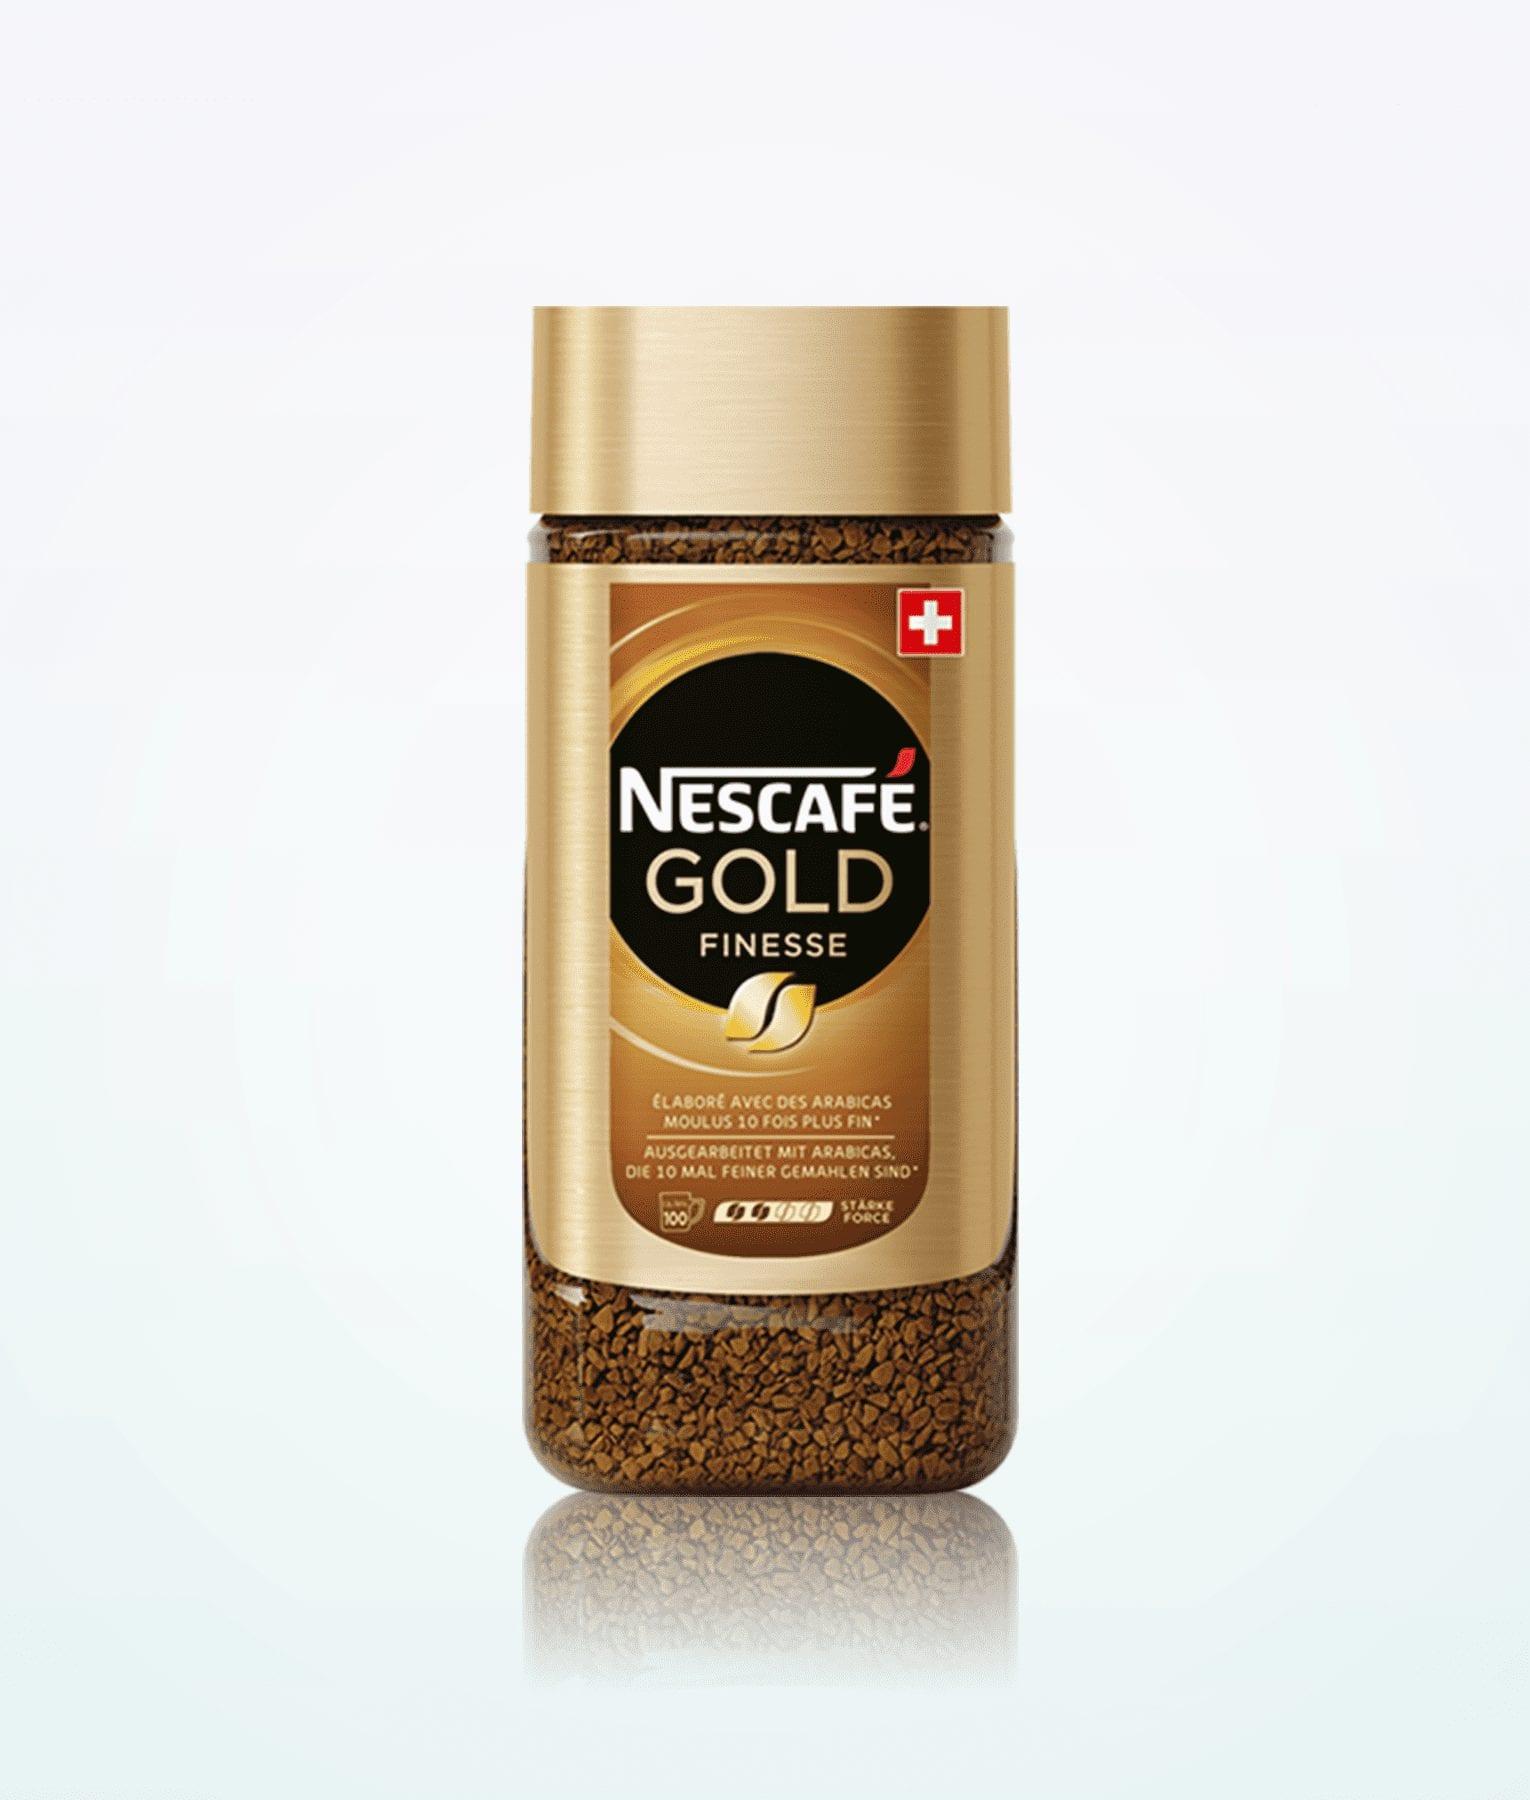 nescafe-gold-finesse-200g